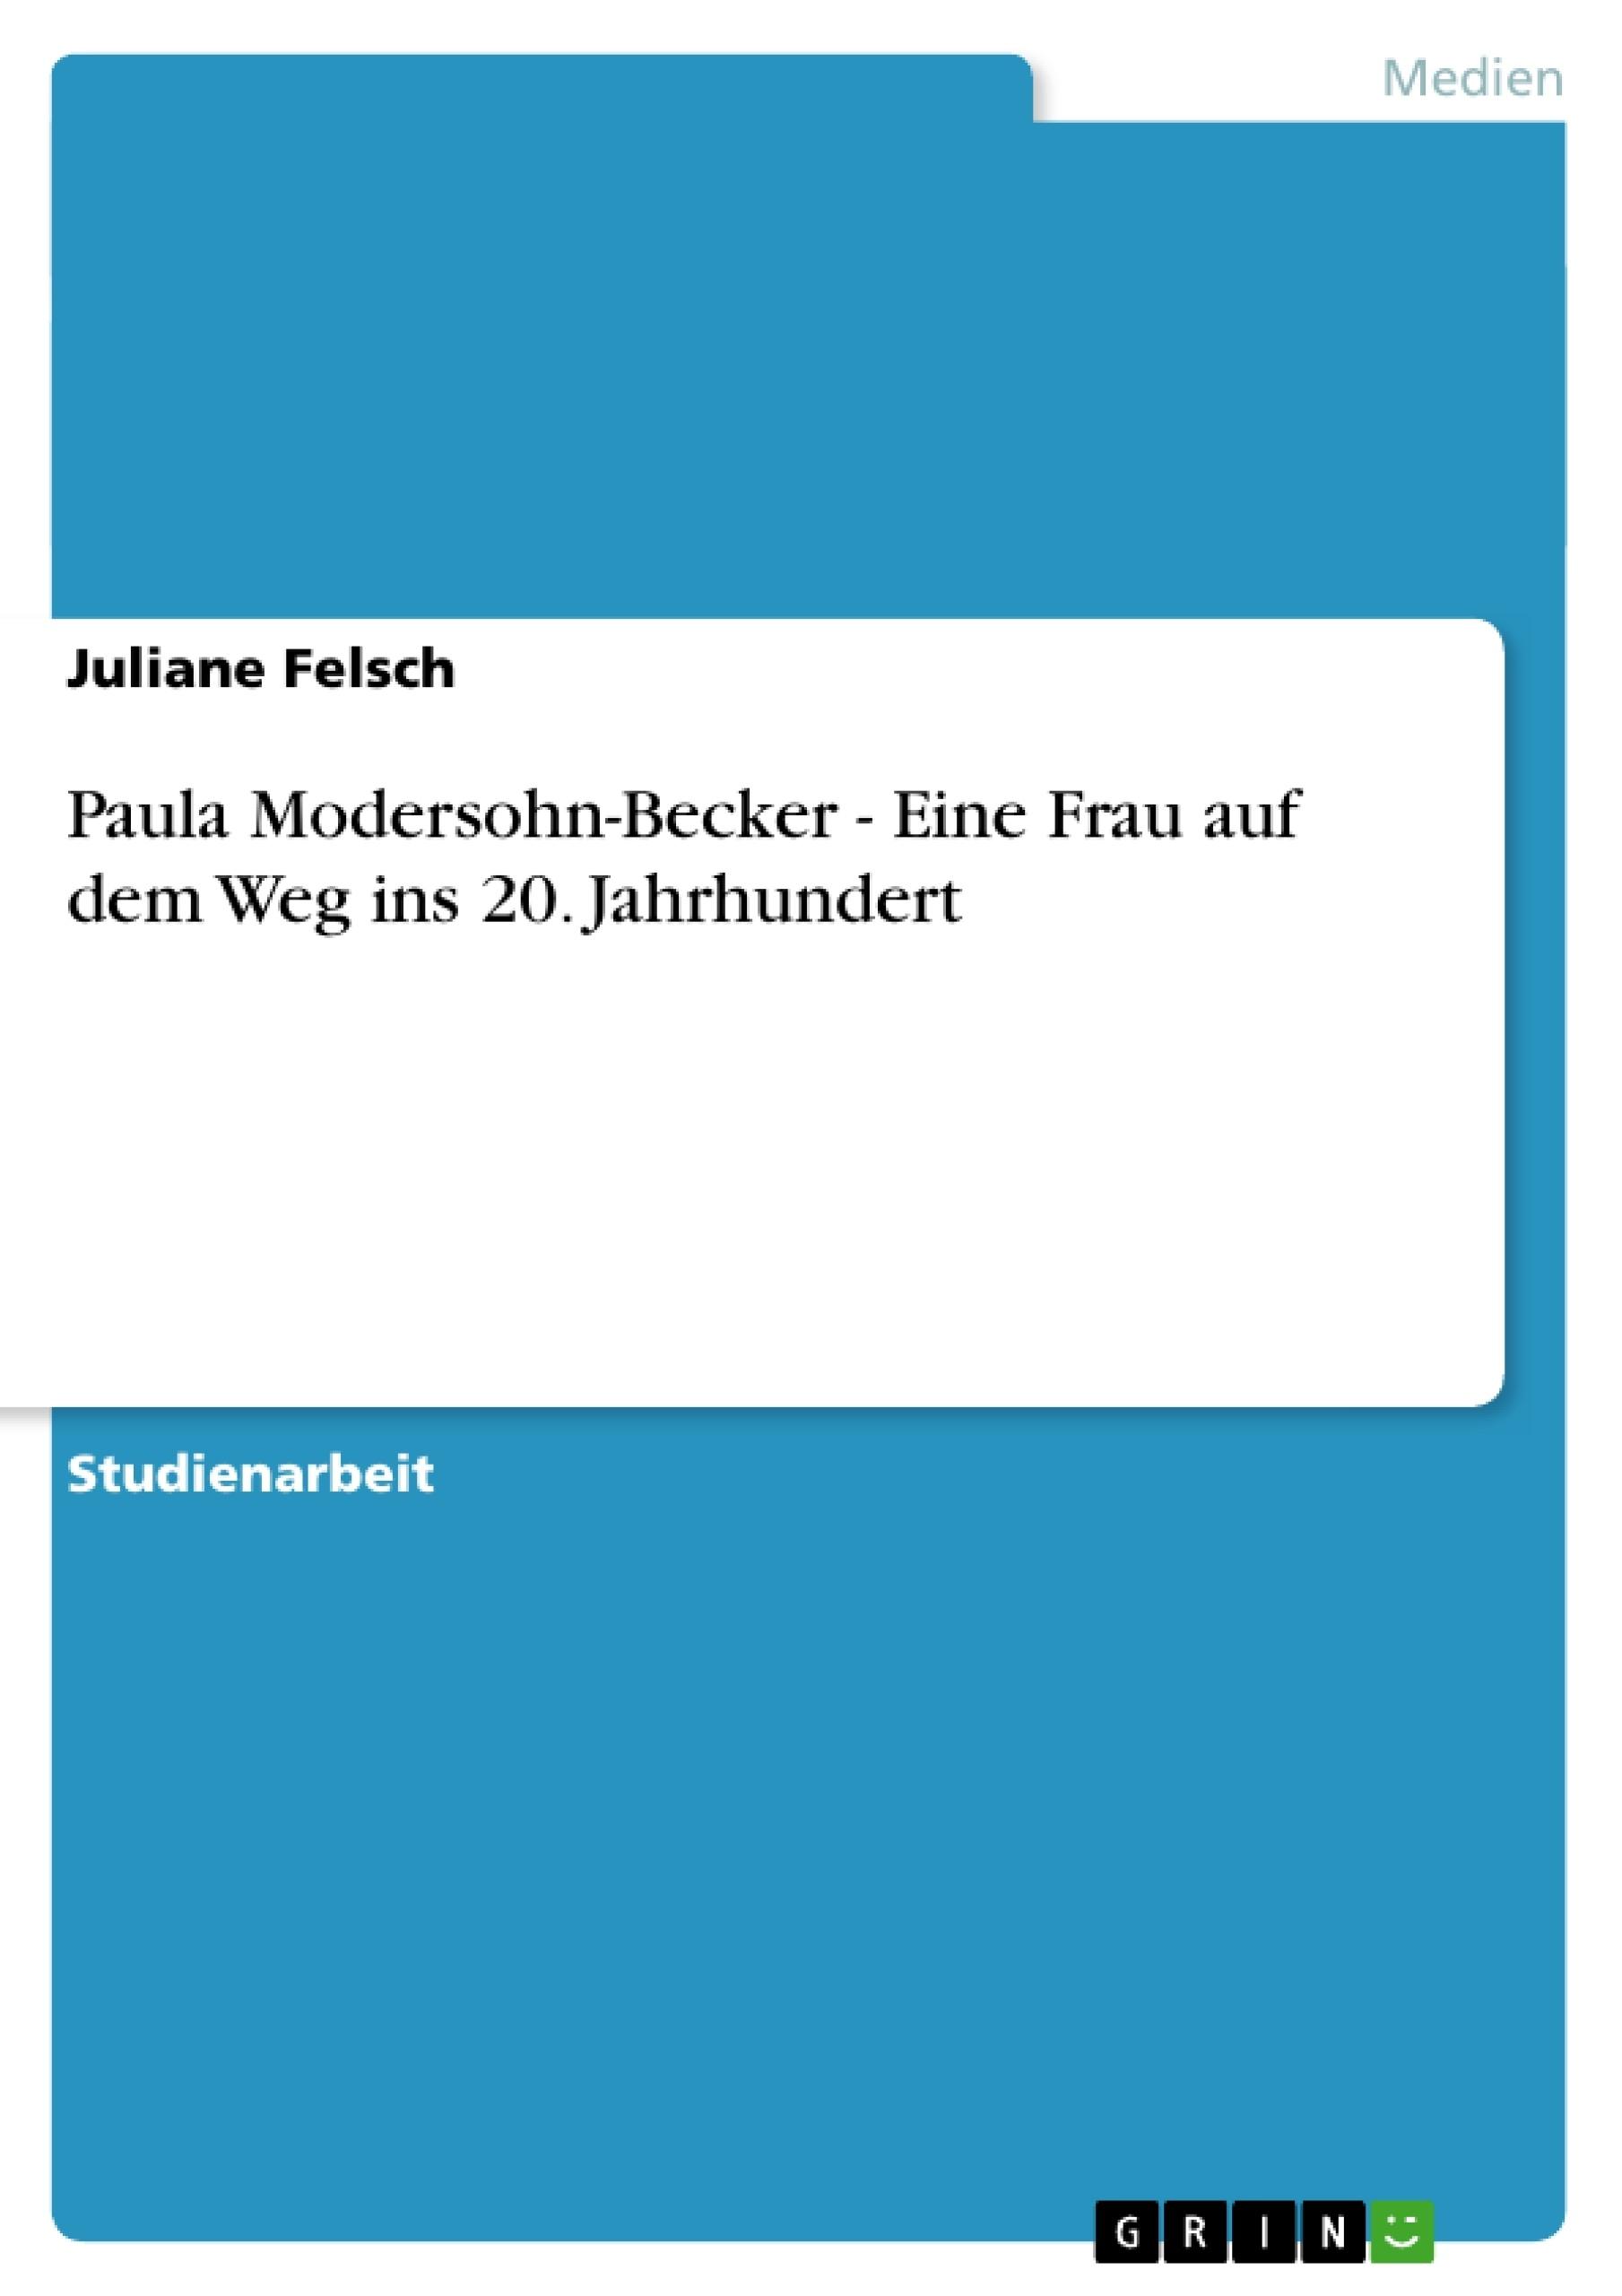 Titel: Paula Modersohn-Becker - Eine Frau auf dem Weg ins 20. Jahrhundert